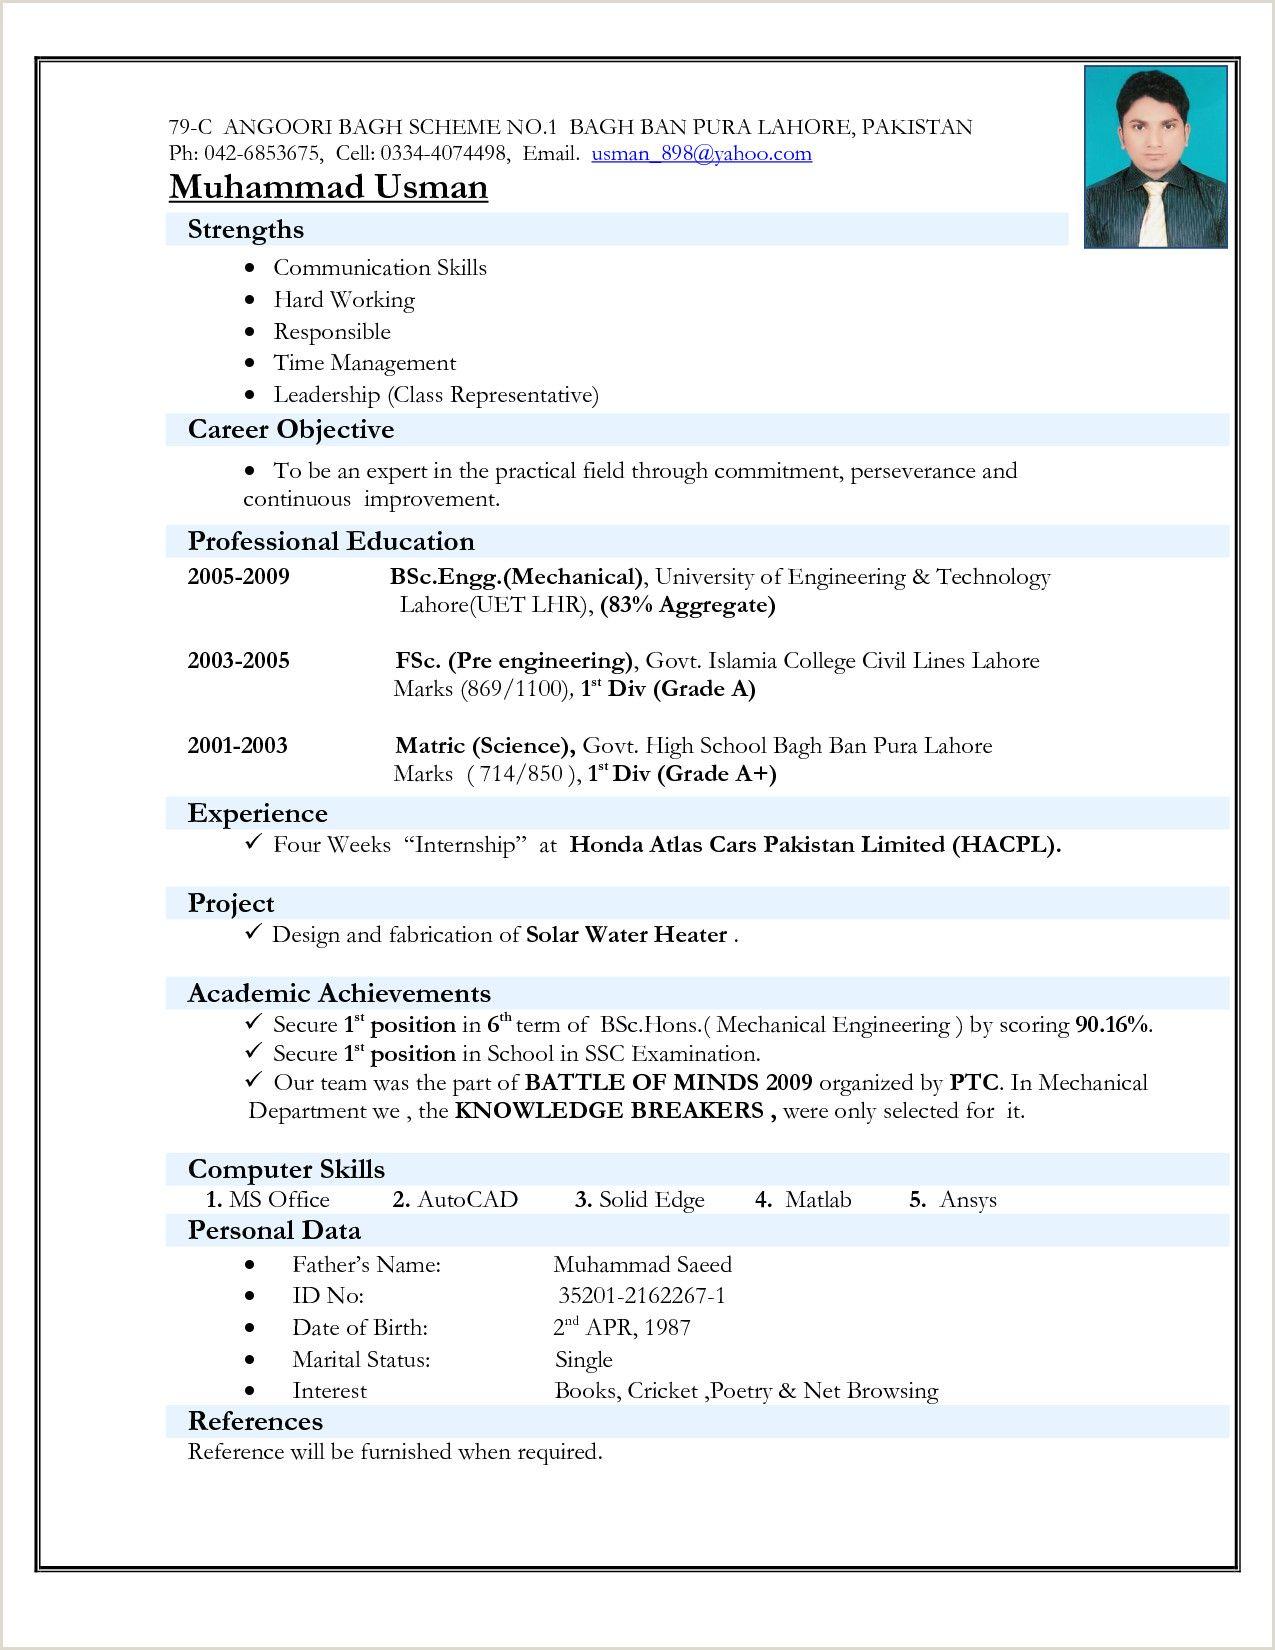 Resume Format Pdf For Freshers